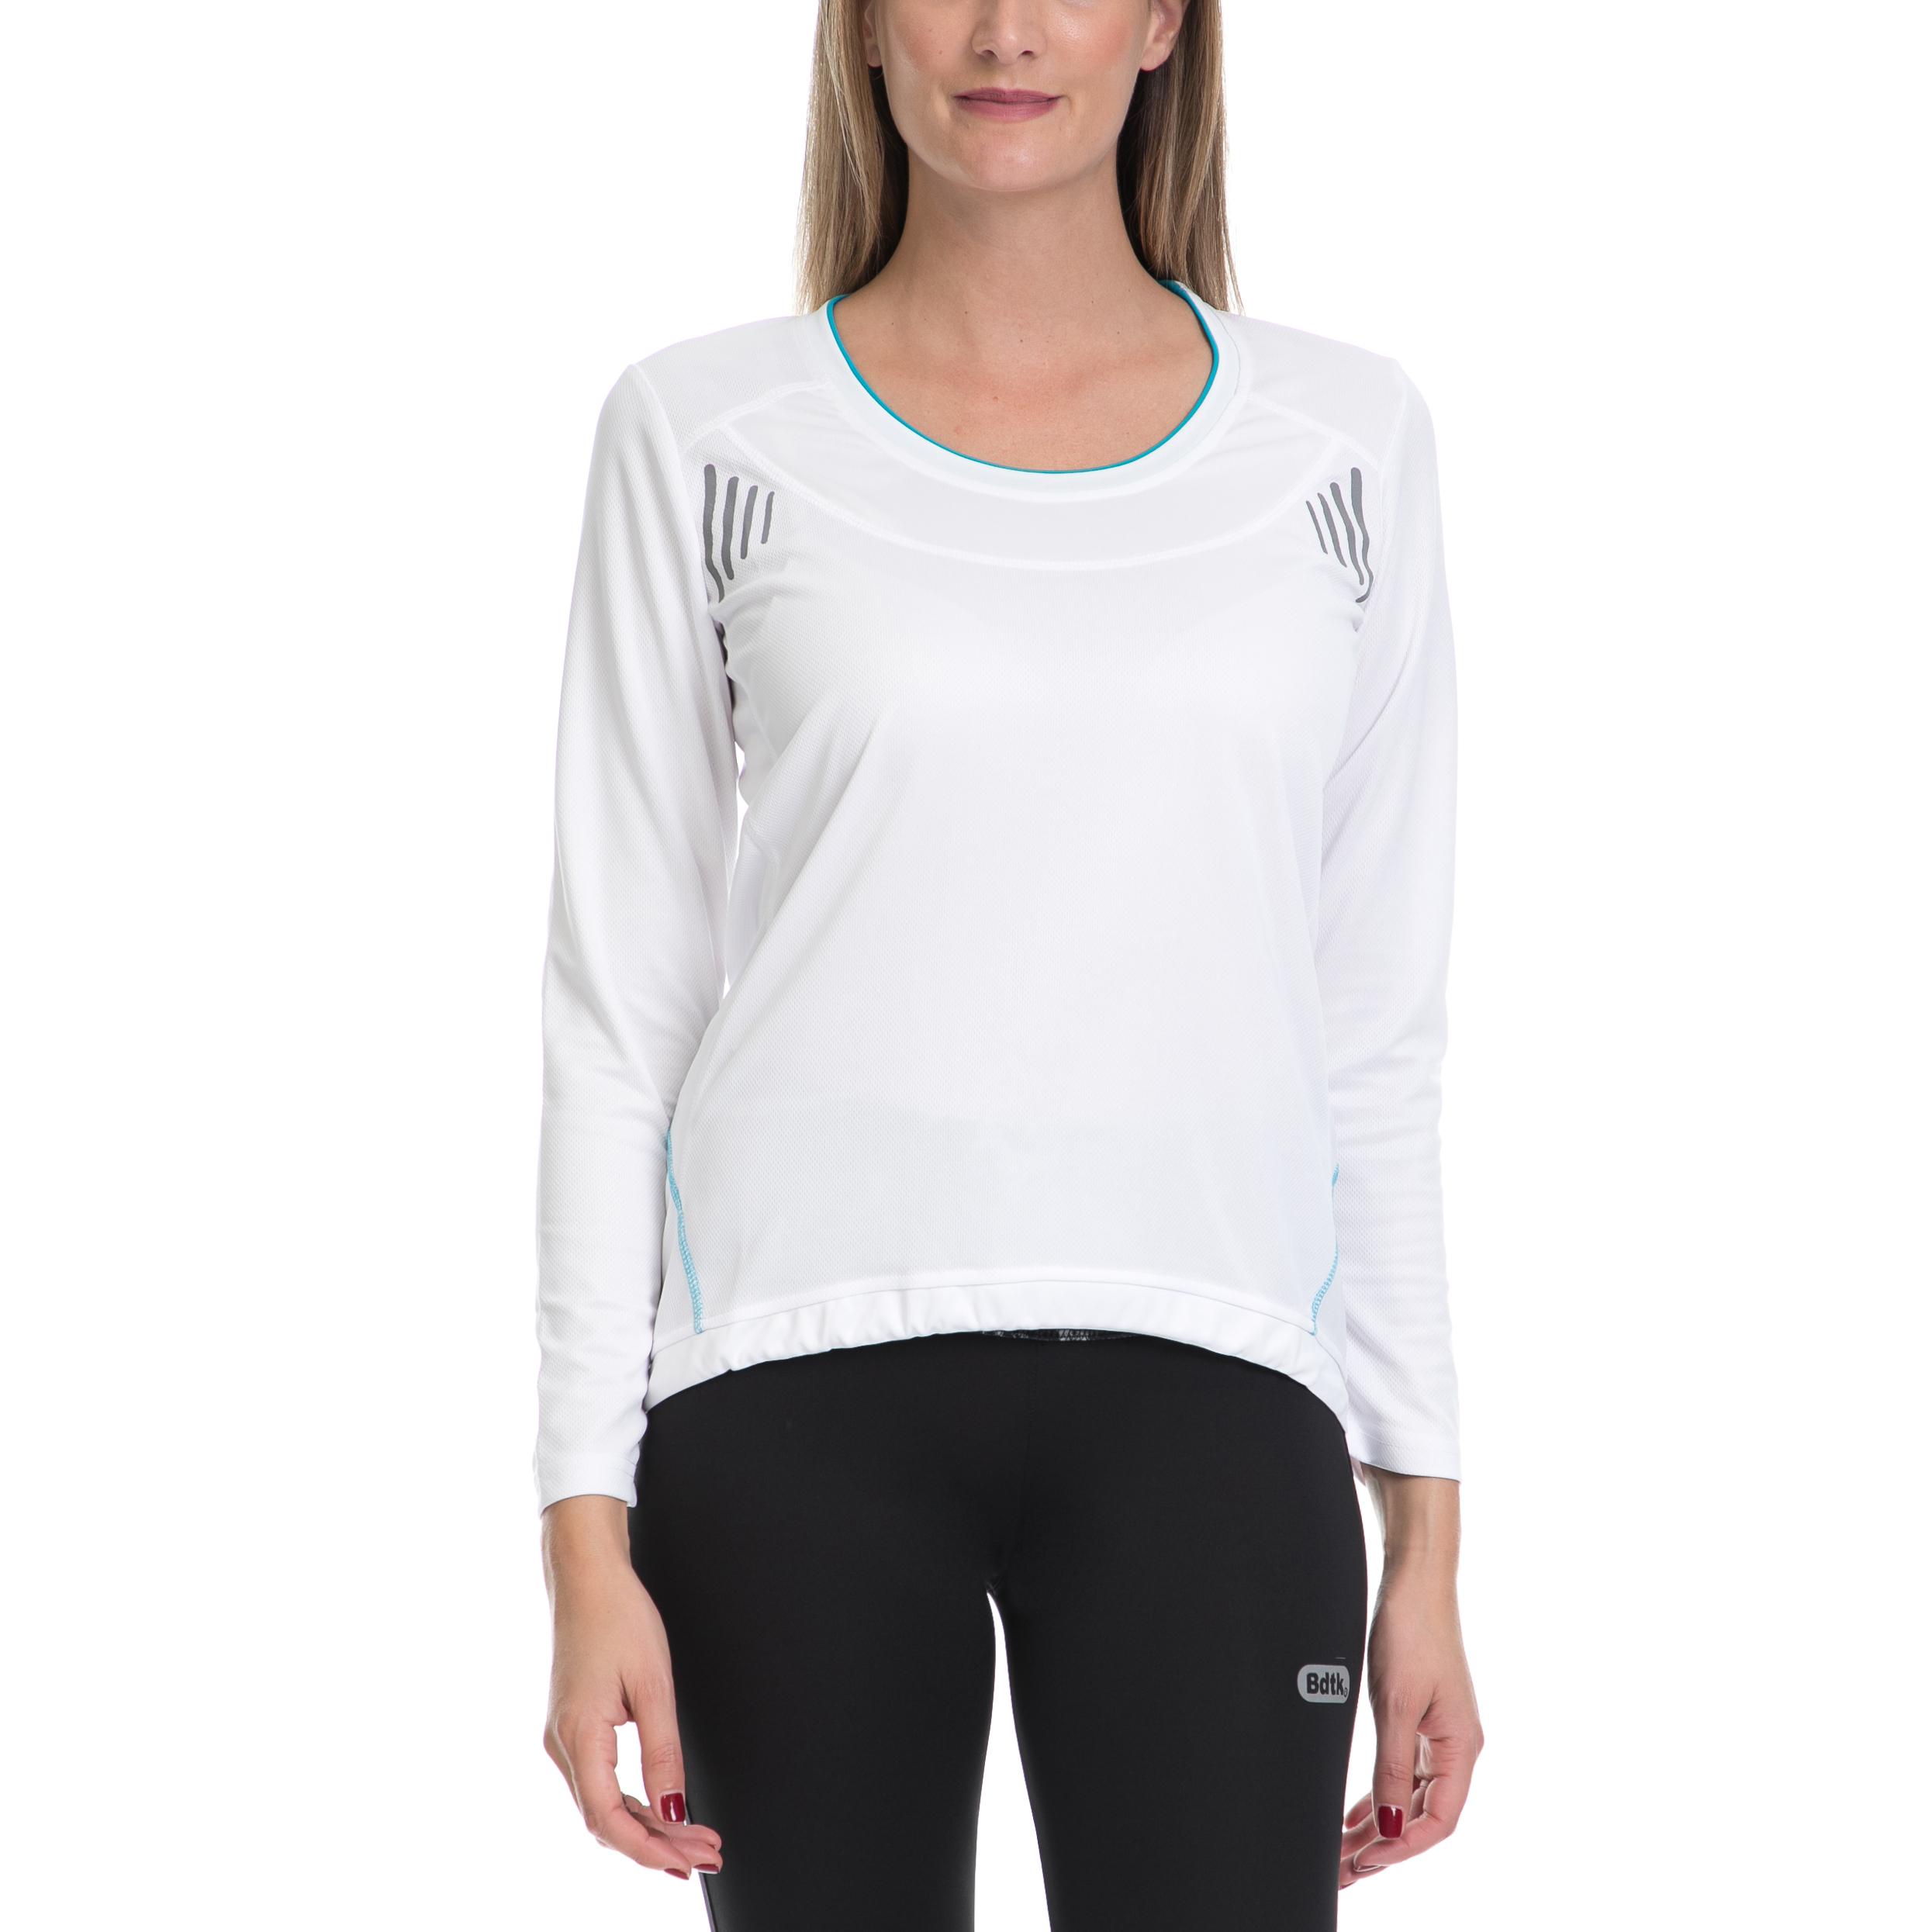 899b8d5dd1e2 BODYTALK - Γυναικεία μπλούζα BODYTALK λευκή